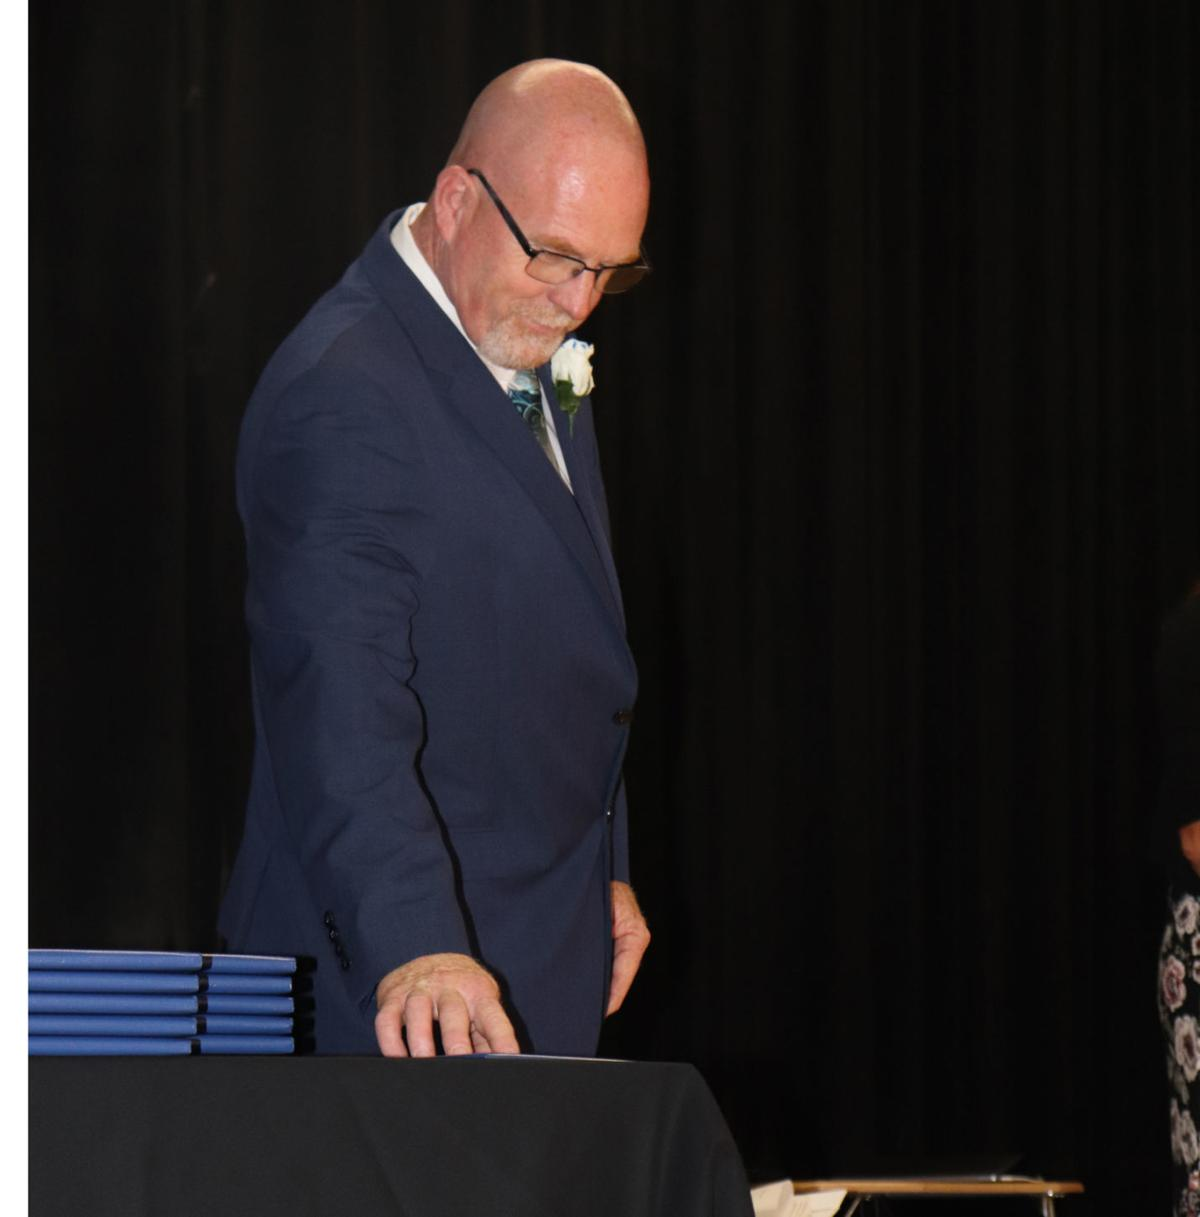 Griswold Celebrates Class of 2020's Graduation